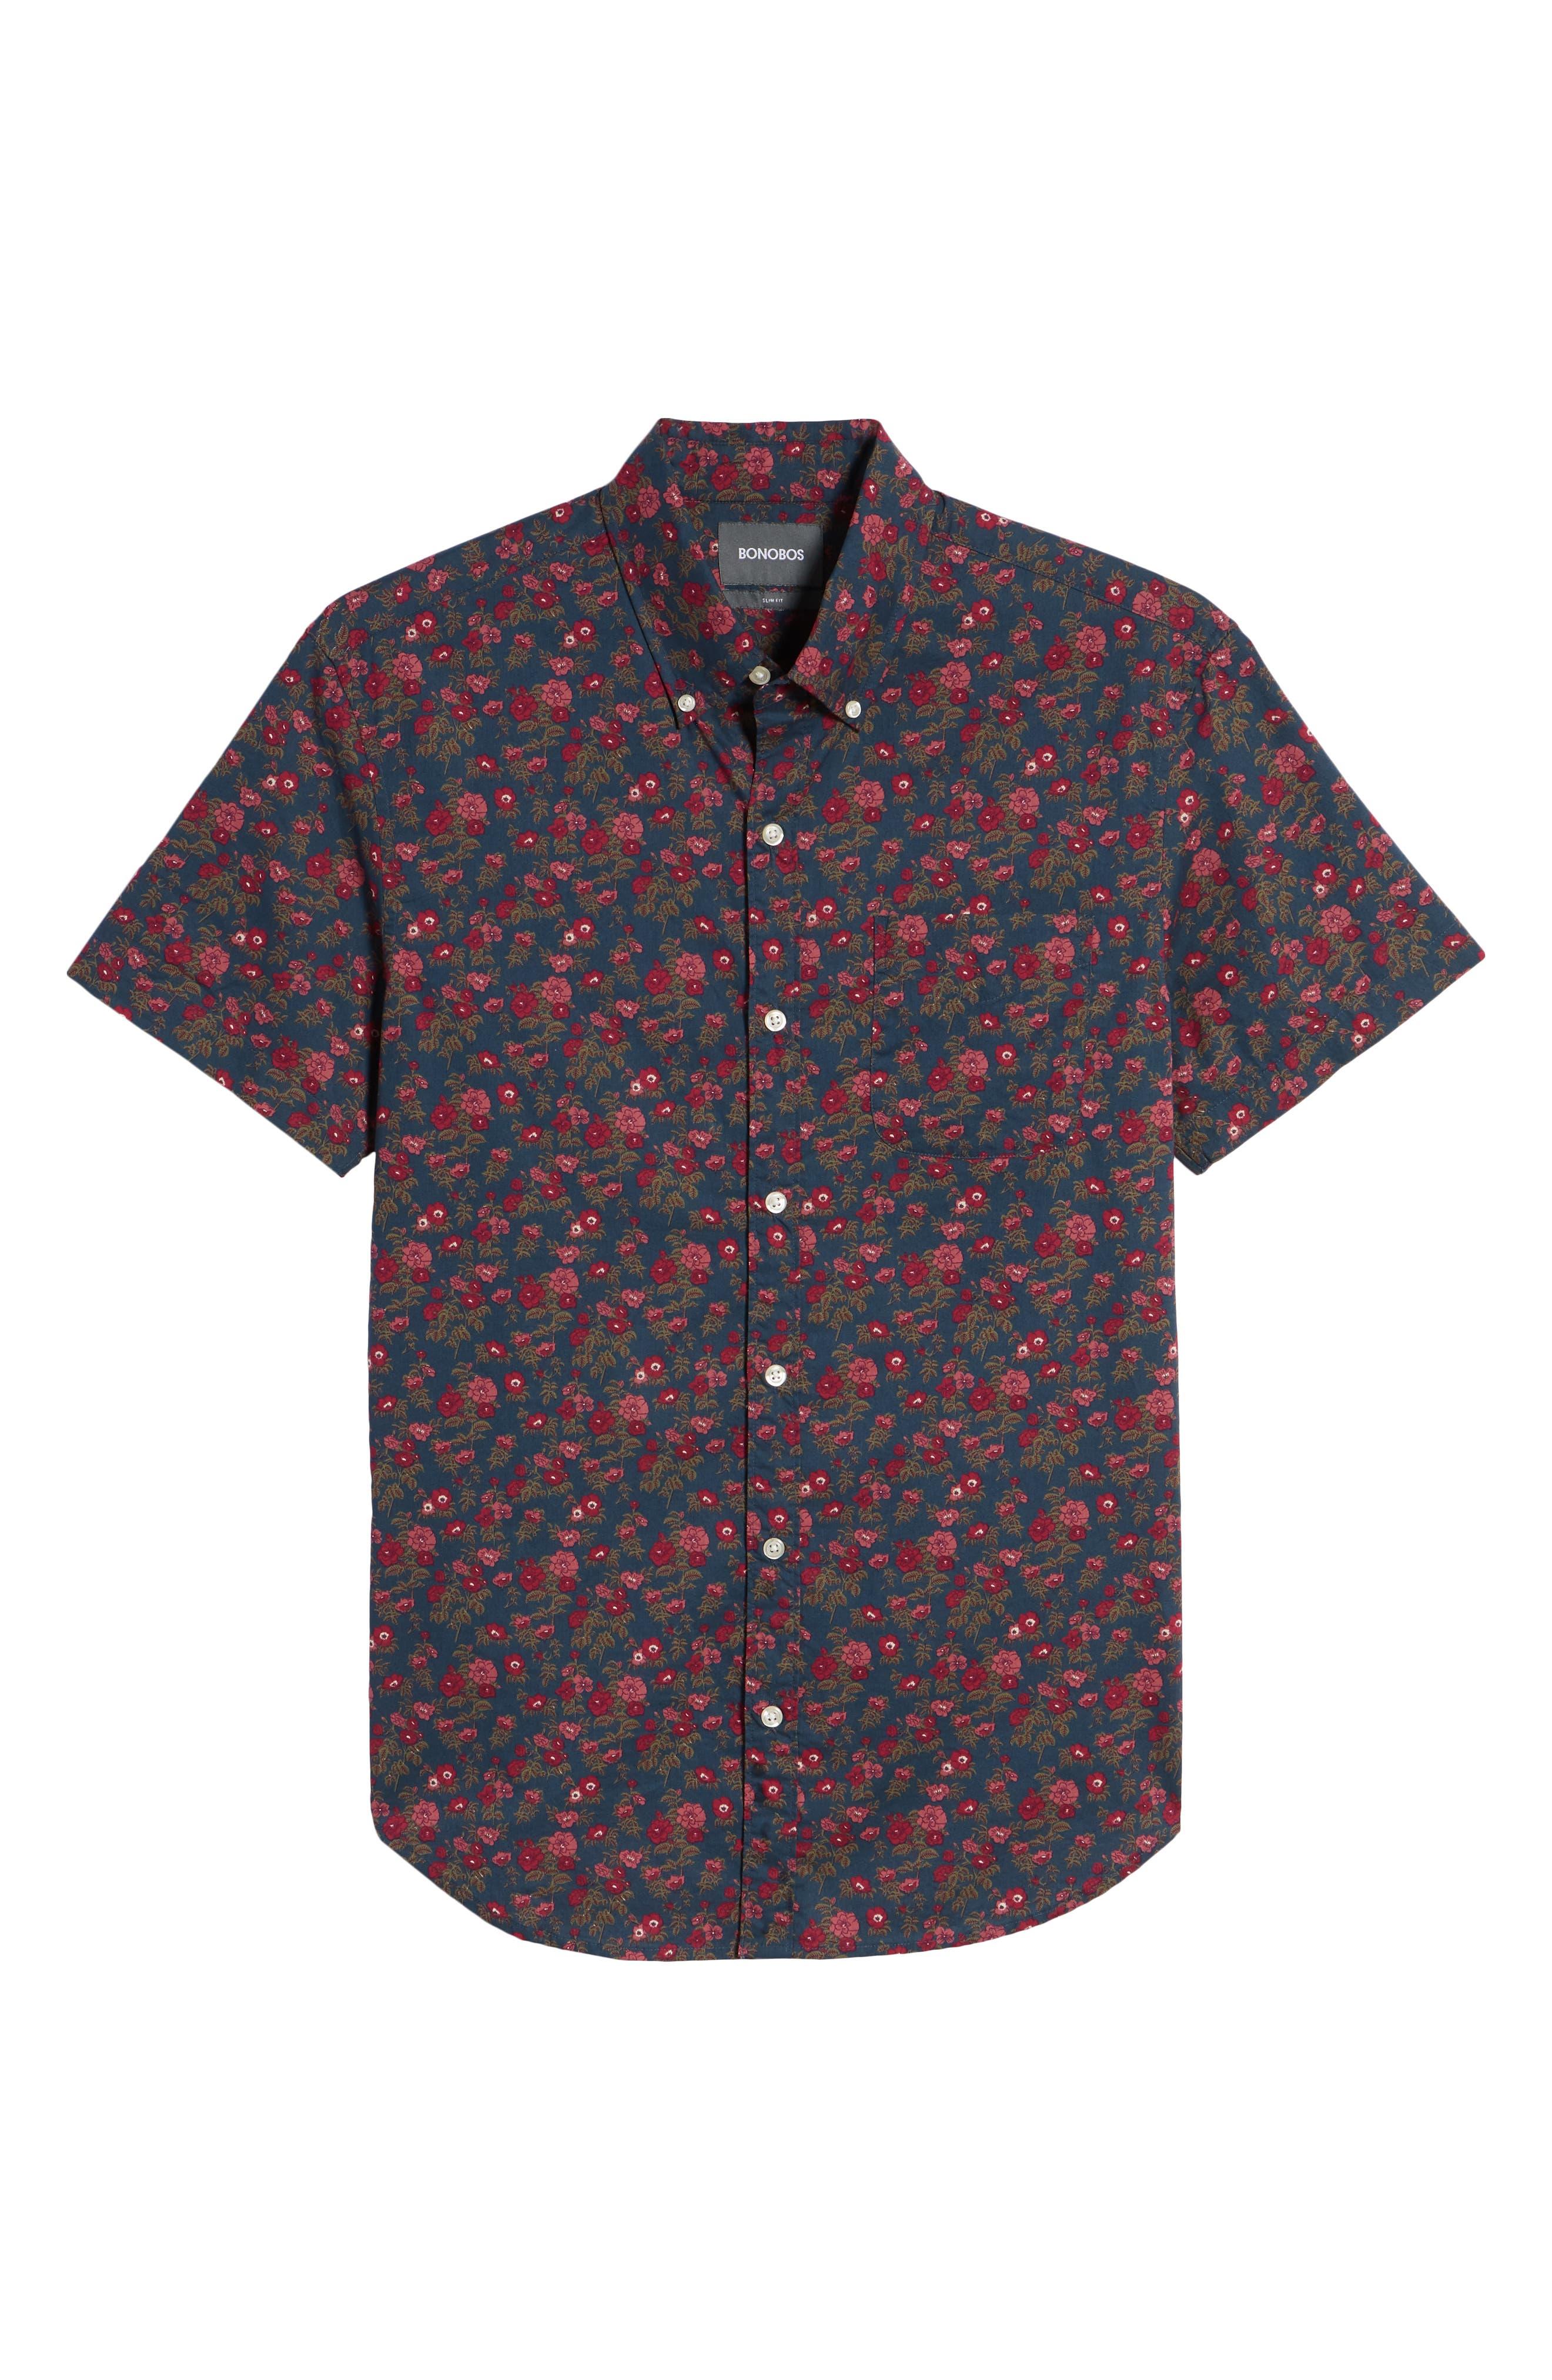 Riviera Slim Fit Floral Print Sport Shirt,                             Alternate thumbnail 6, color,                             Dandy Floral - Pickled Beet